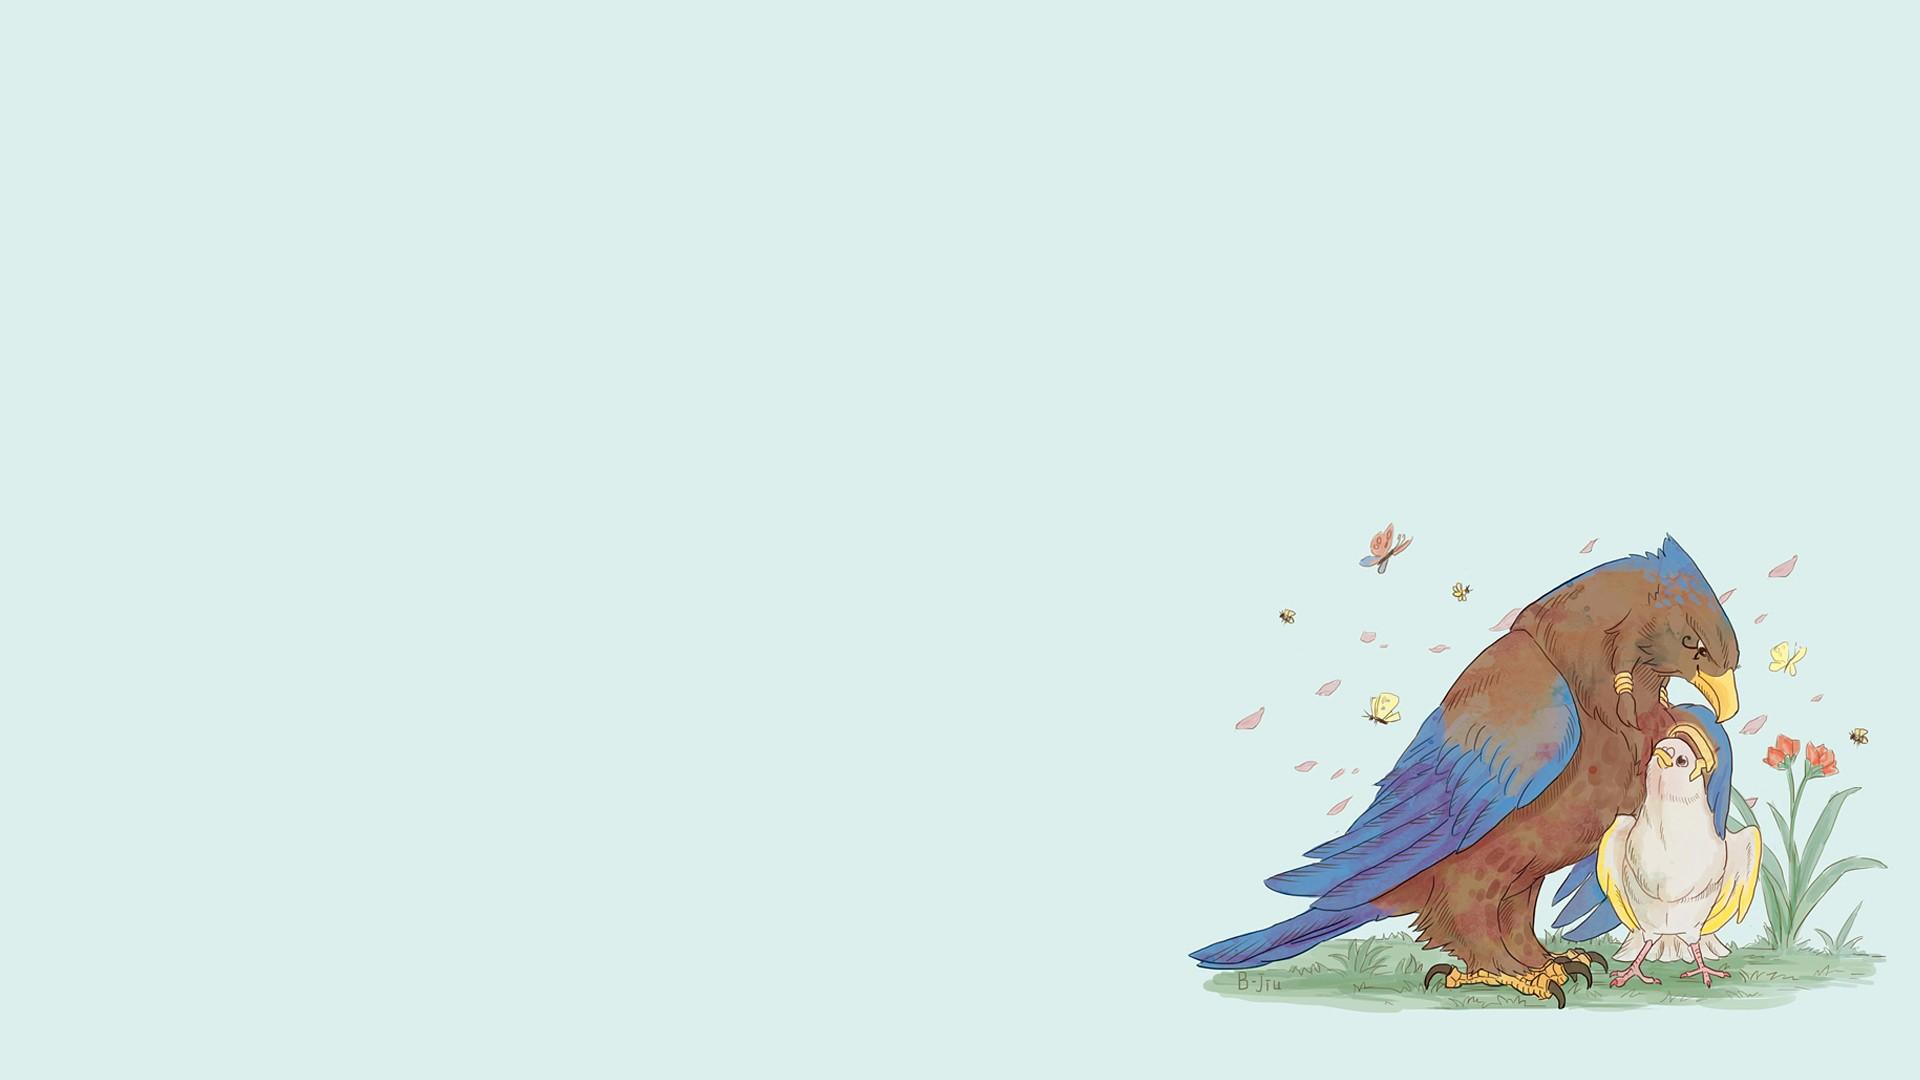 Wallpaper Illustration Birds Cartoon Mercy Overwatch